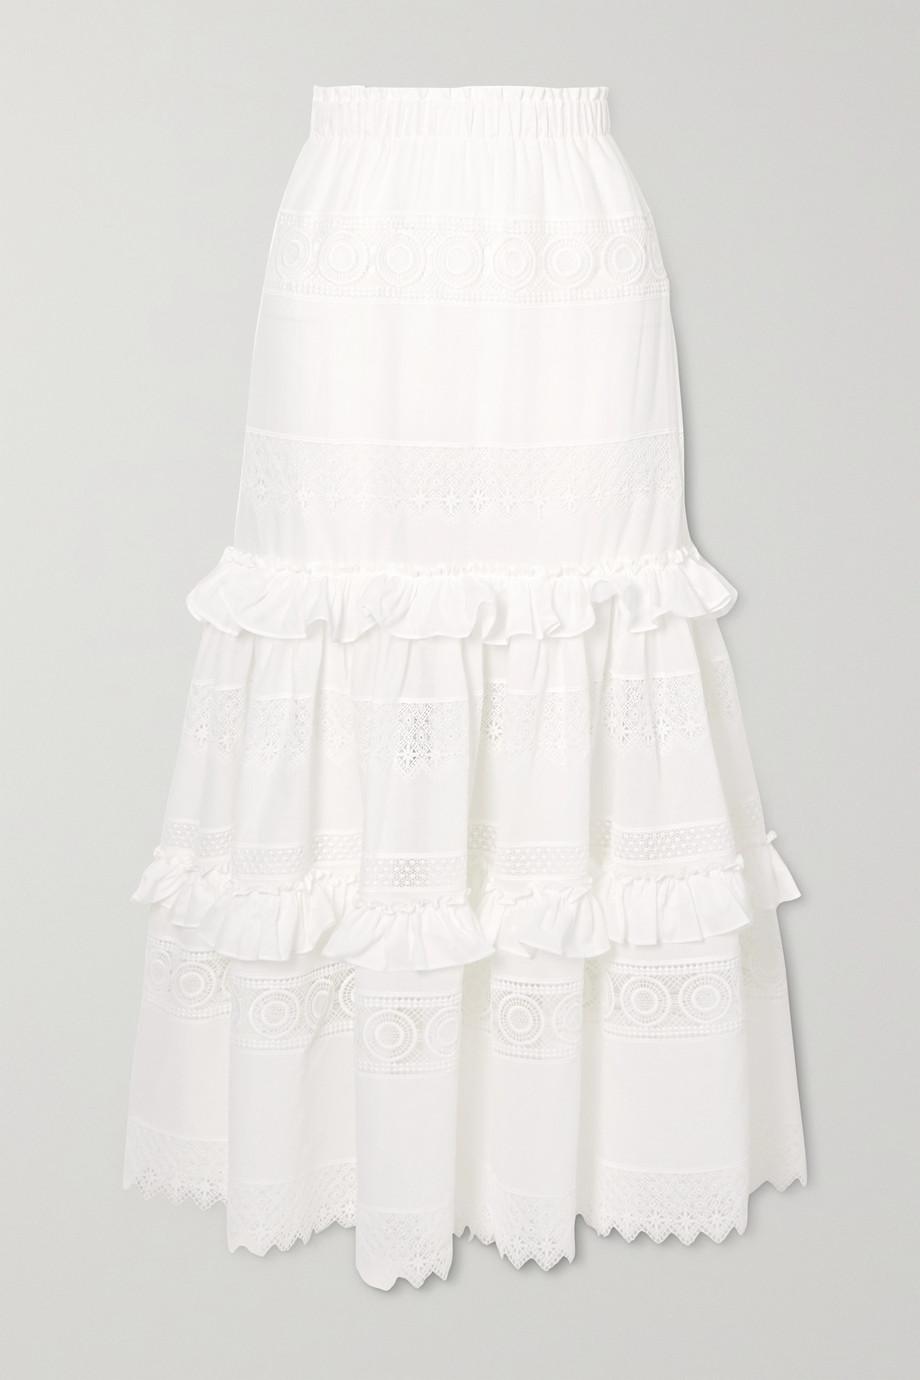 WAIMARI Venus 荷叶边凸纹蕾丝边饰巴里纱超长半身裙